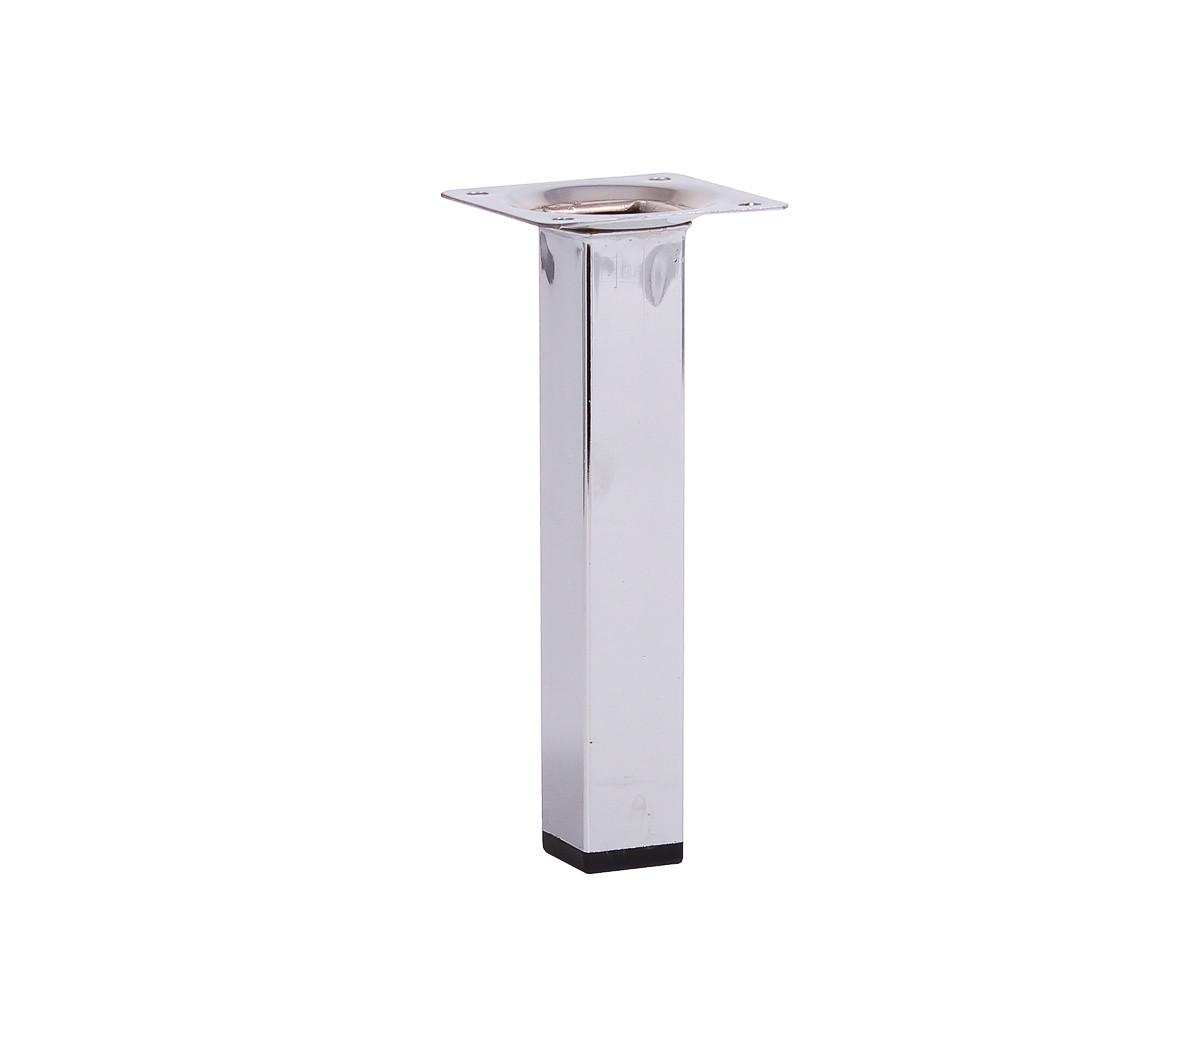 Ножка мебельная квадратная Larvij  150xd25 мм Хром(L61S15CH25)